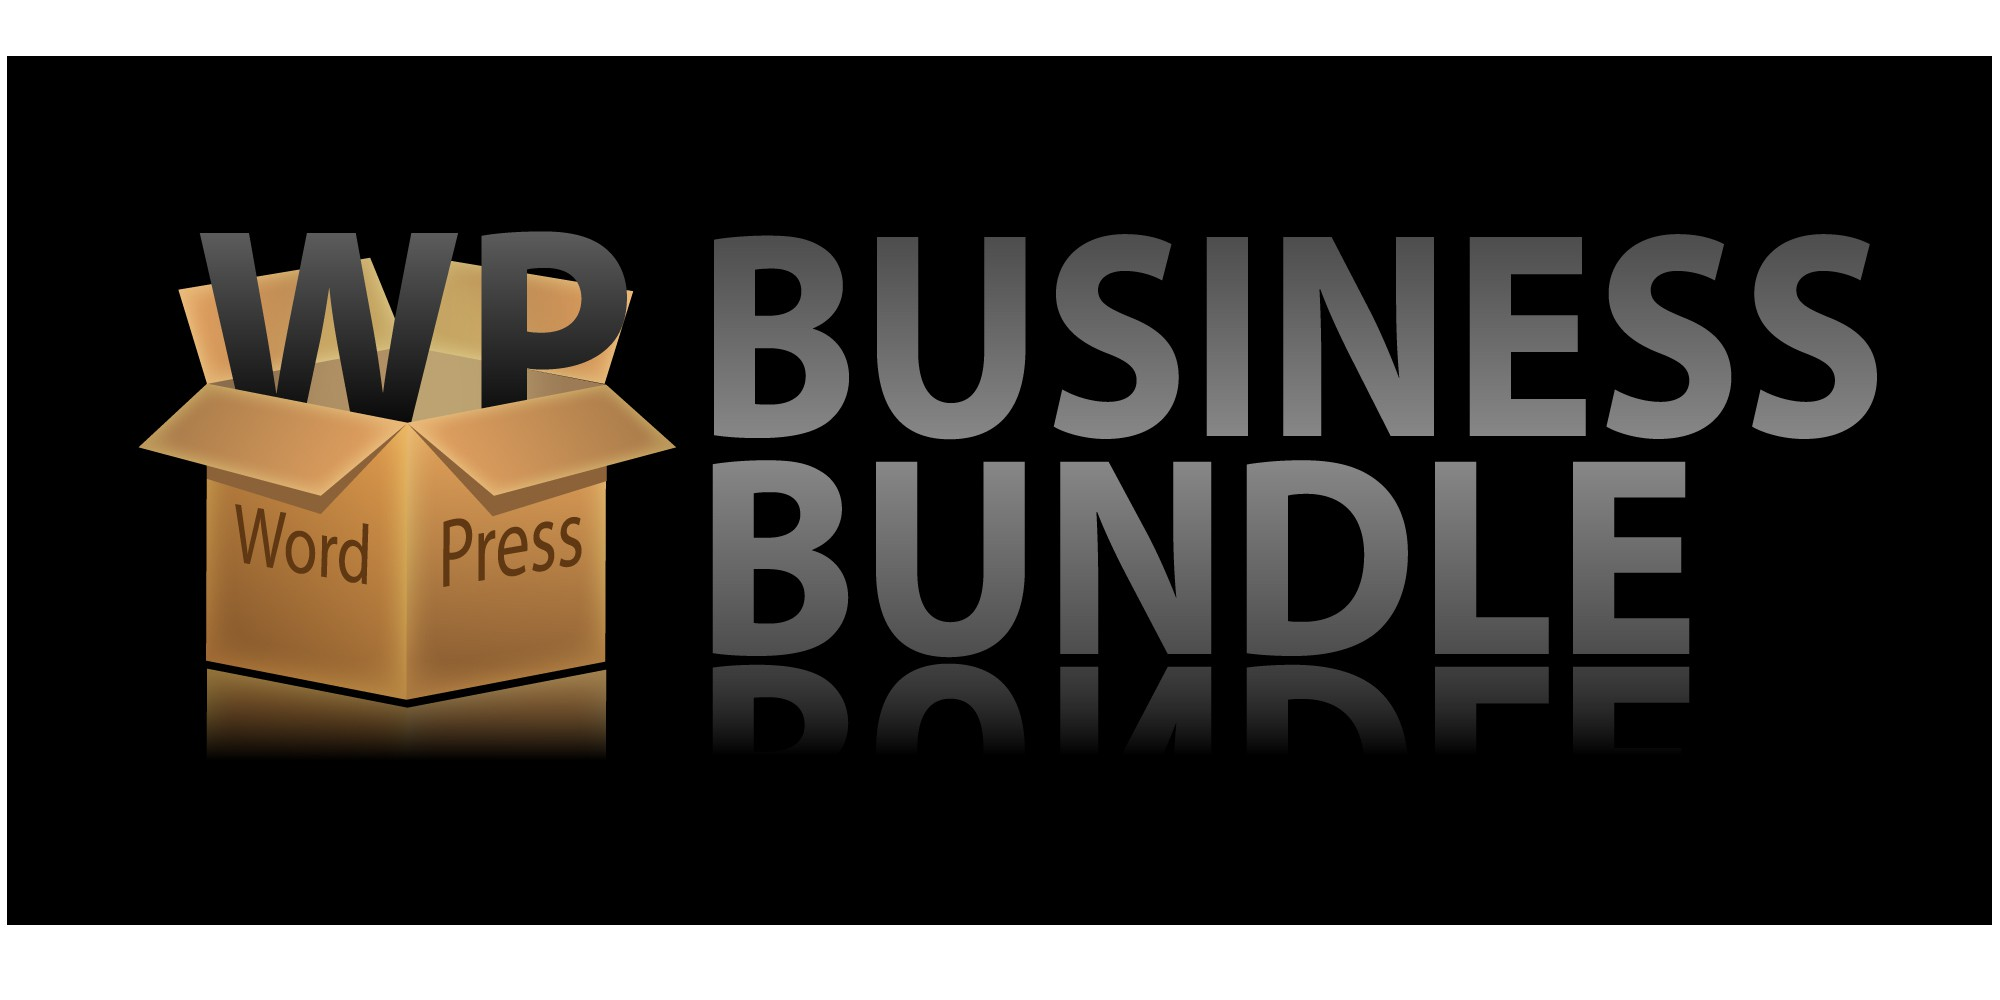 WP Business Bundle needs a new logo